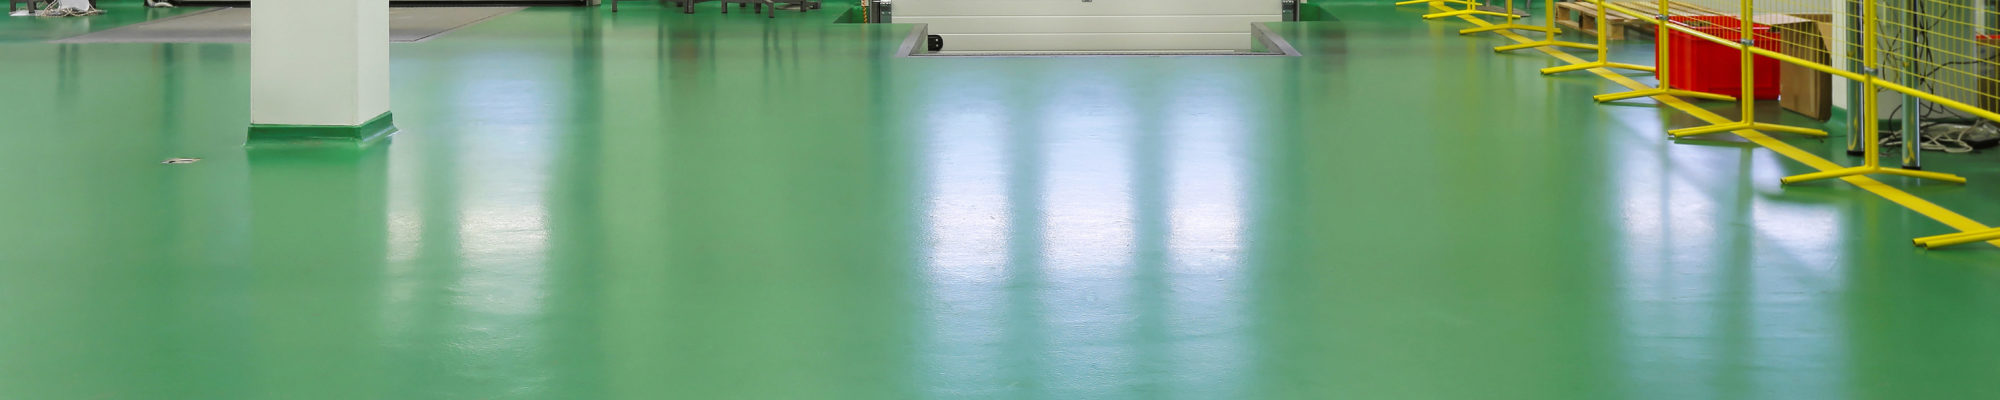 Loading bay green resin floor